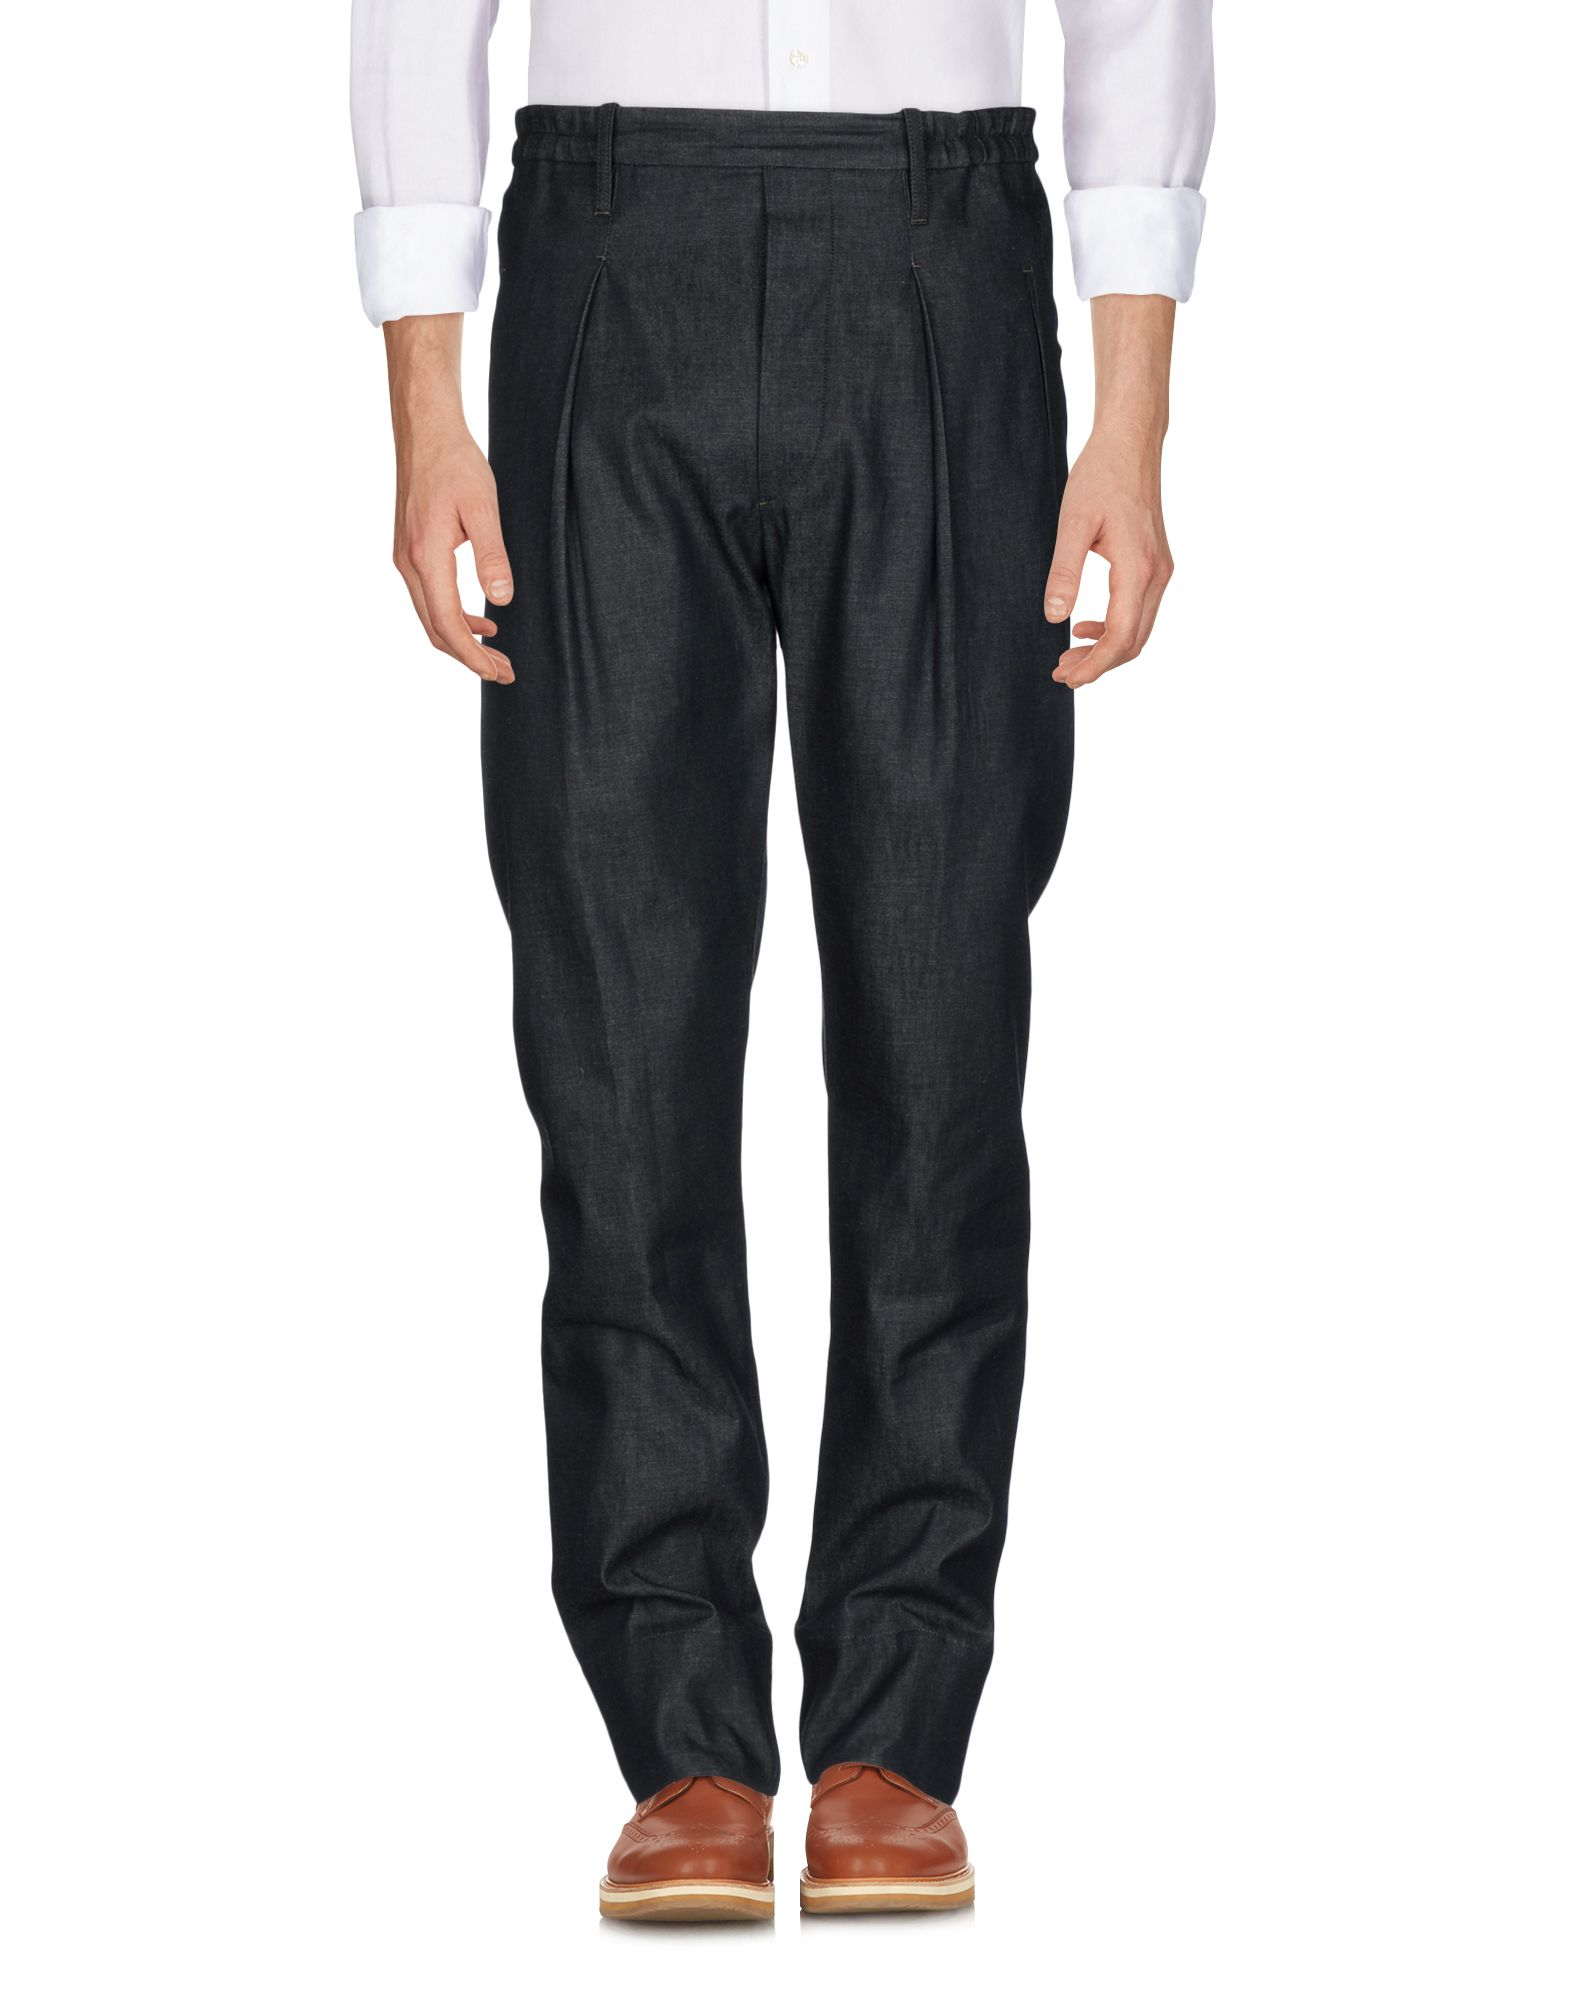 Pantalone Lemaire Uomo - Acquista online su